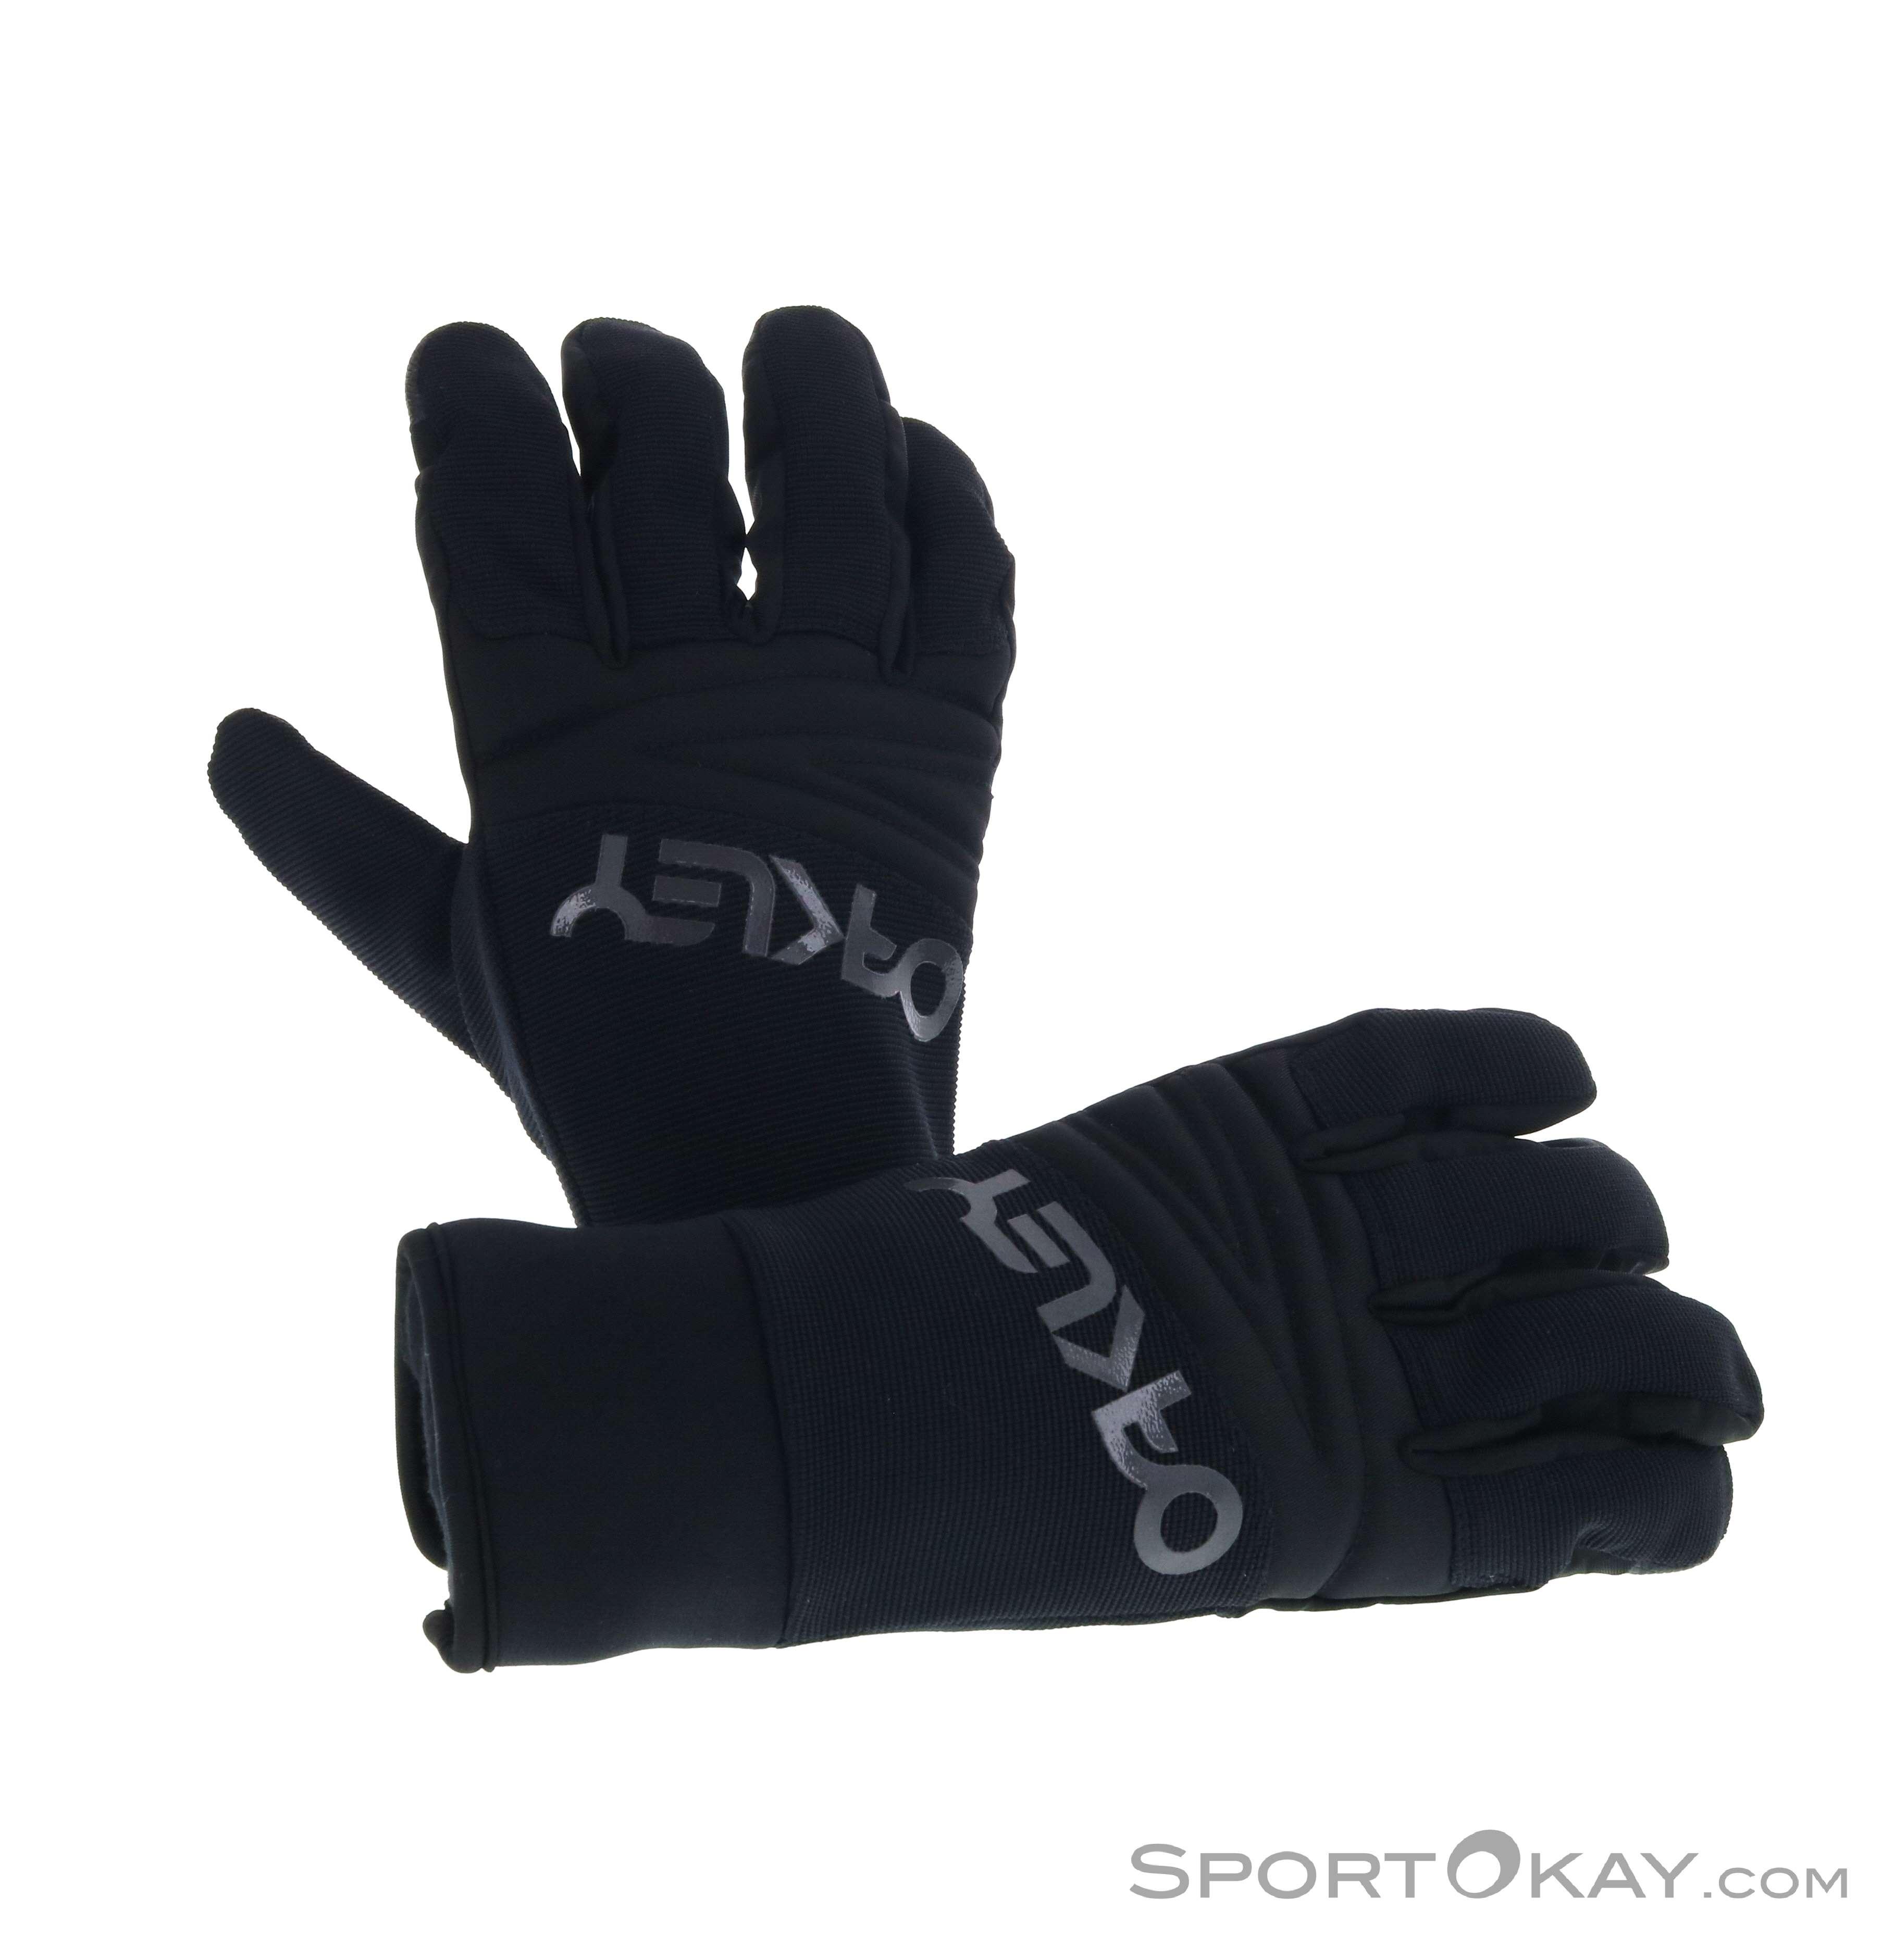 Oakley Factory Park Glove Handschuhe-Schwarz-S